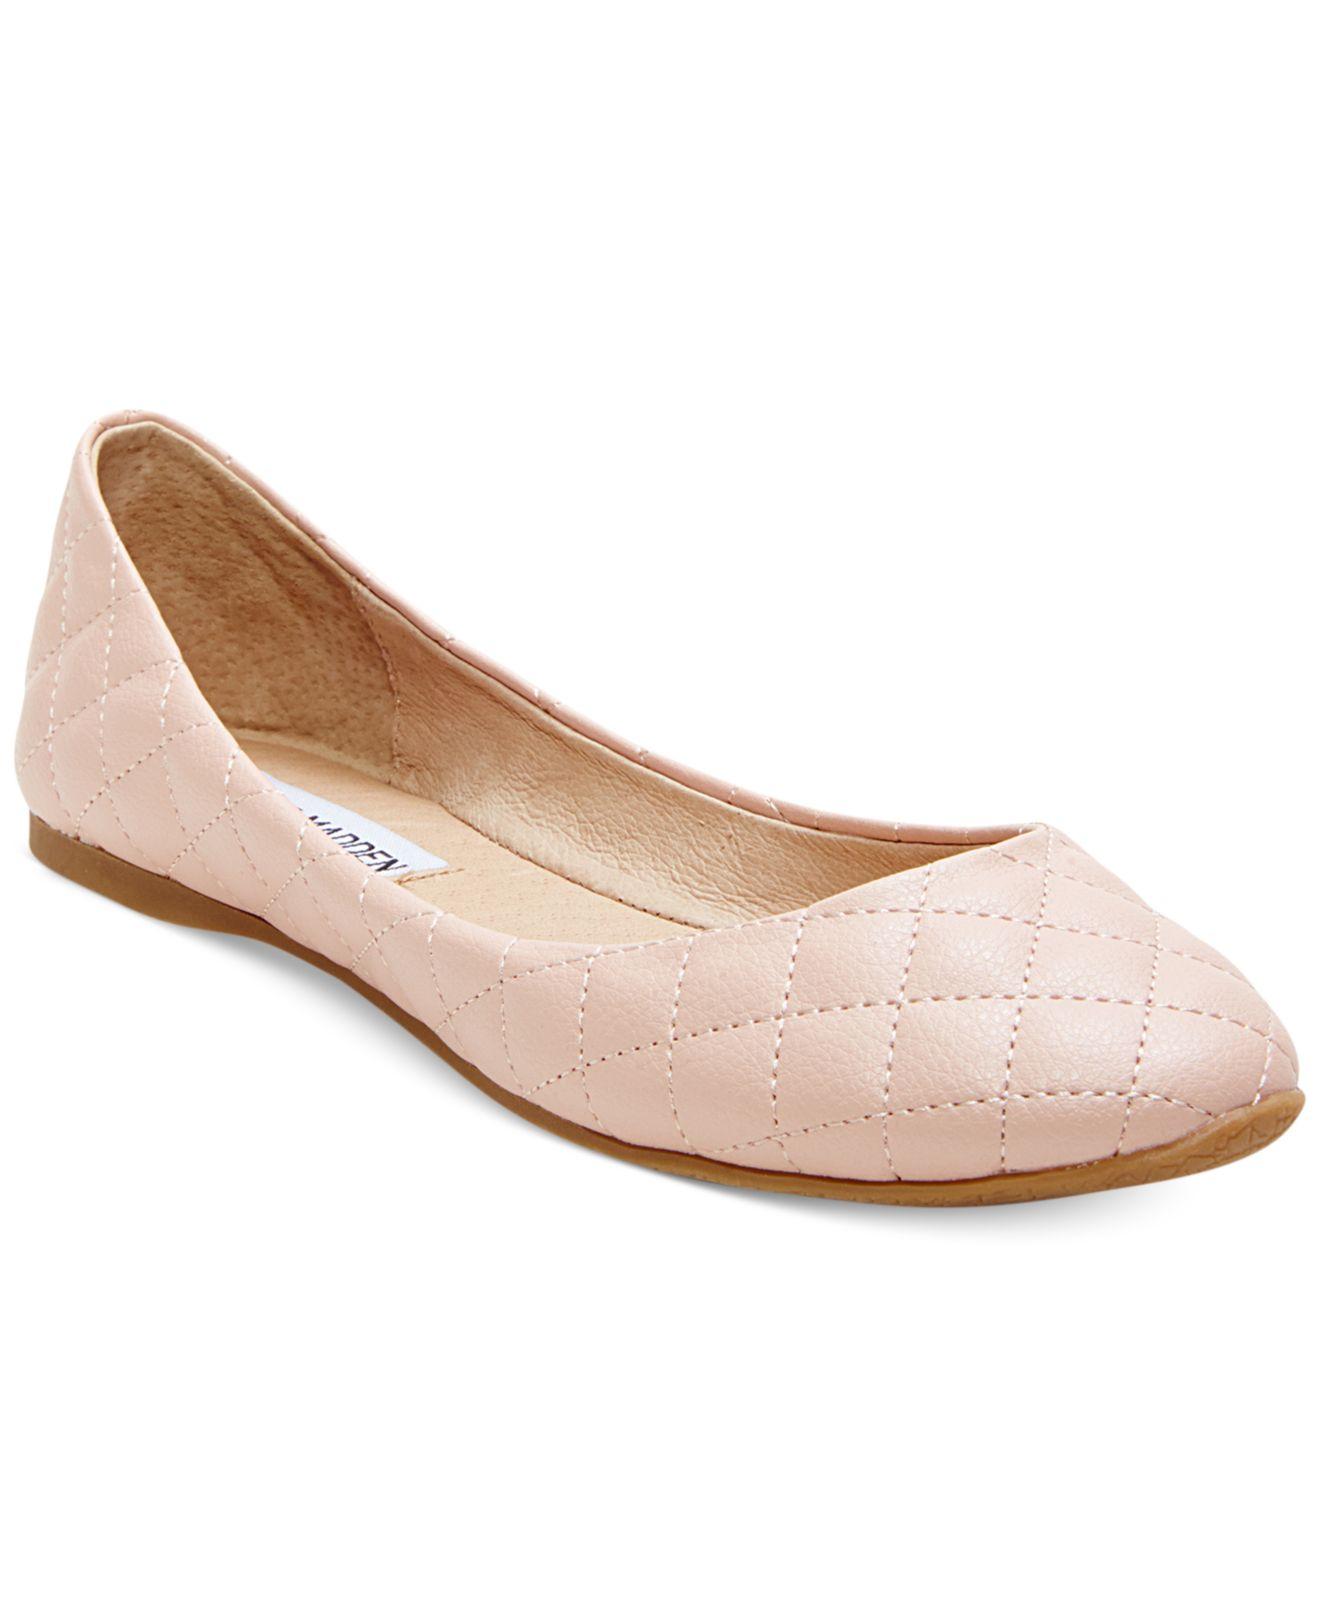 96380278353 Lyst Steve Madden Kwiltt Quilted Flats In Pink. Gallery. Lyst Steve Madden  Gold Tone Kwiltt Ballet Flats In Metallic